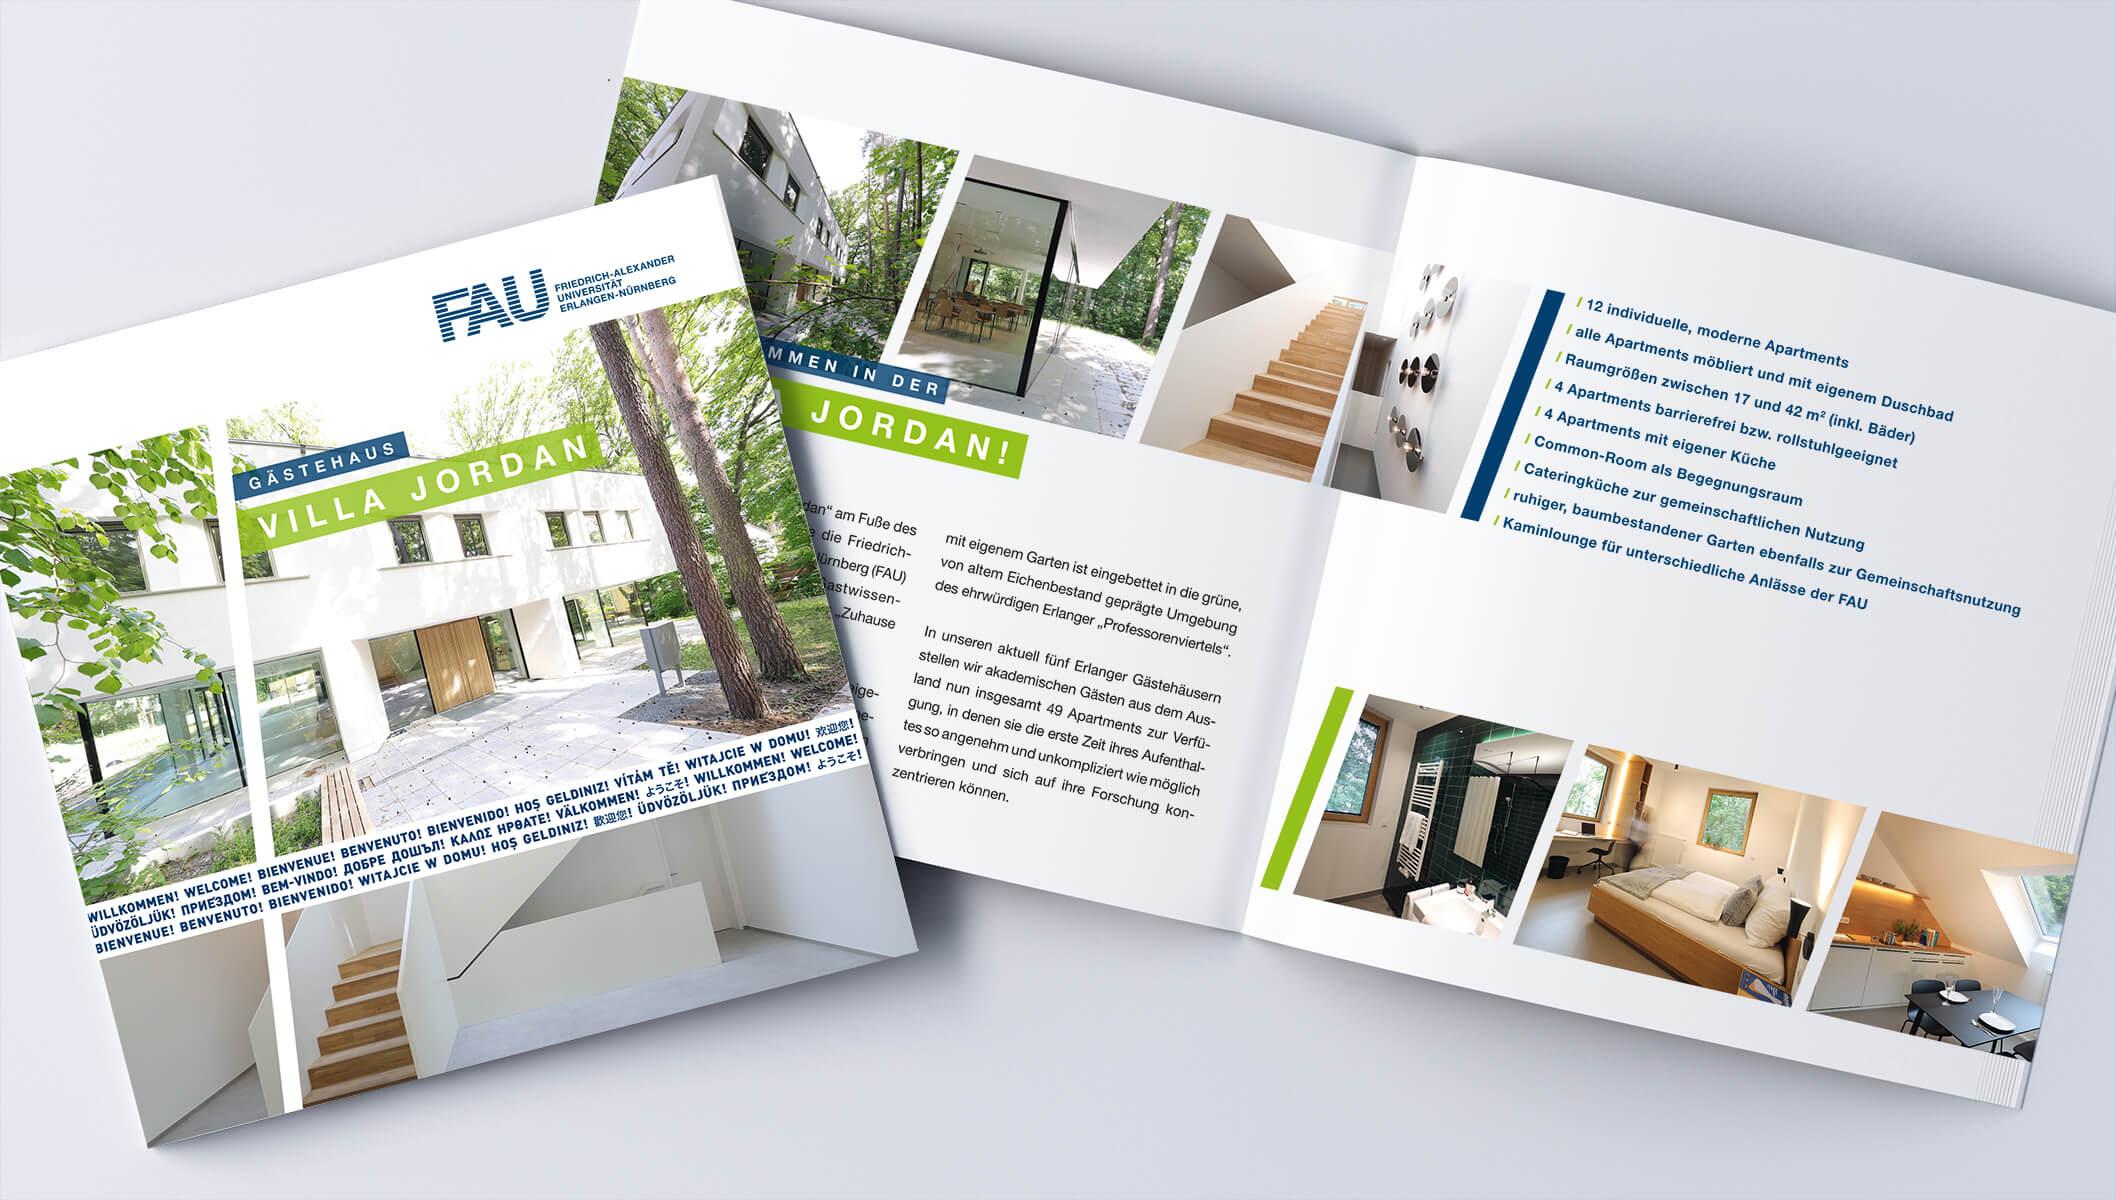 "FAU Gästehaus ""Villa Jordan Eröffnung"" Einladung"